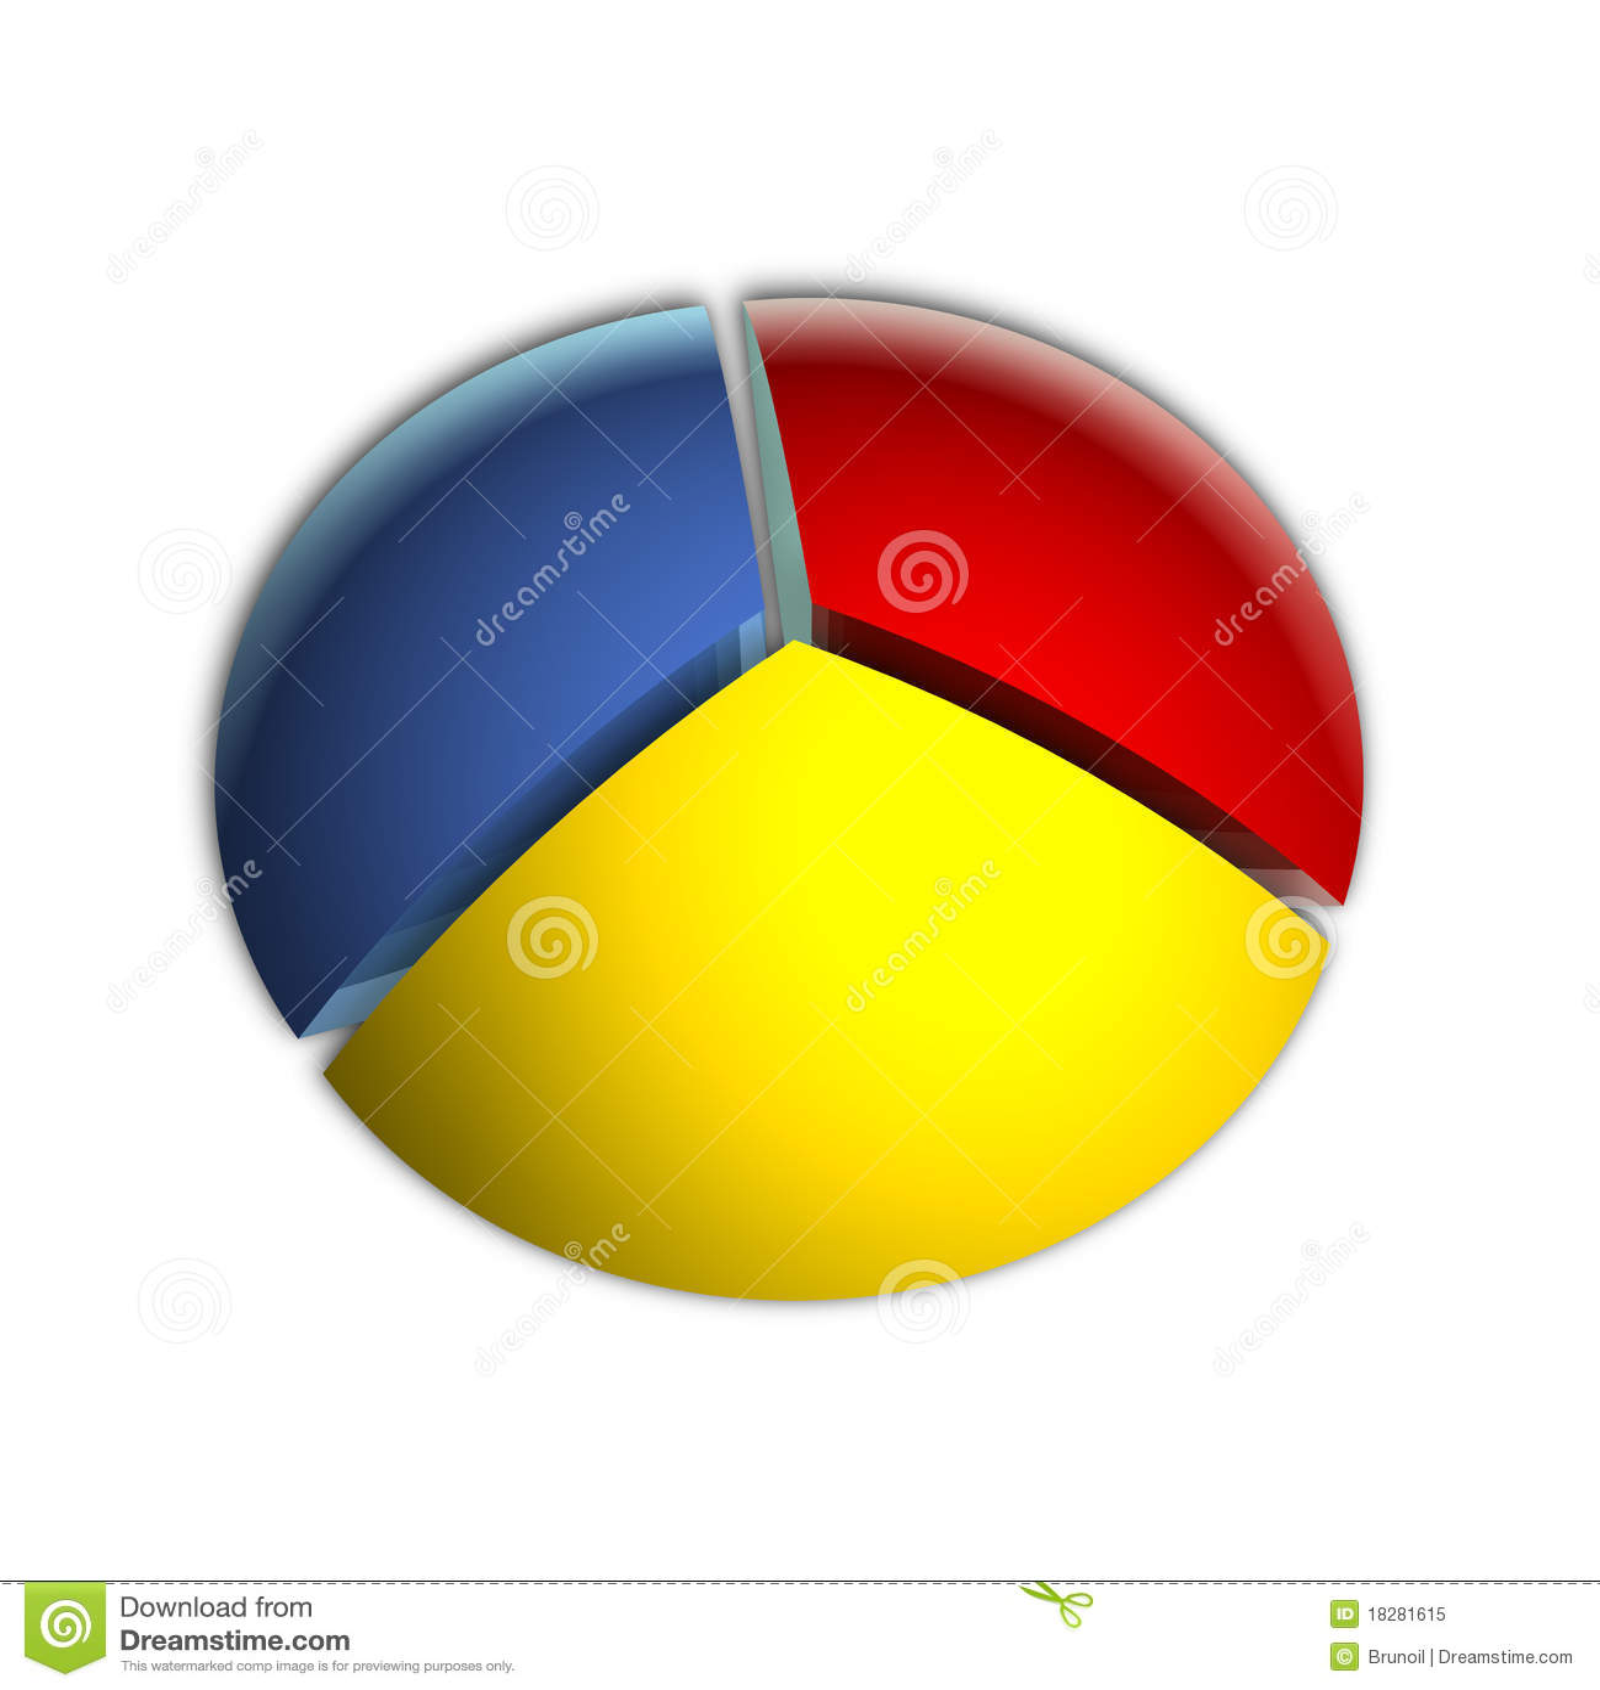 Football pie chart gantt chart download 33 business pie chart stock illustration illustration of diagram 33 business pie chart 18281615 royalty nvjuhfo Choice Image